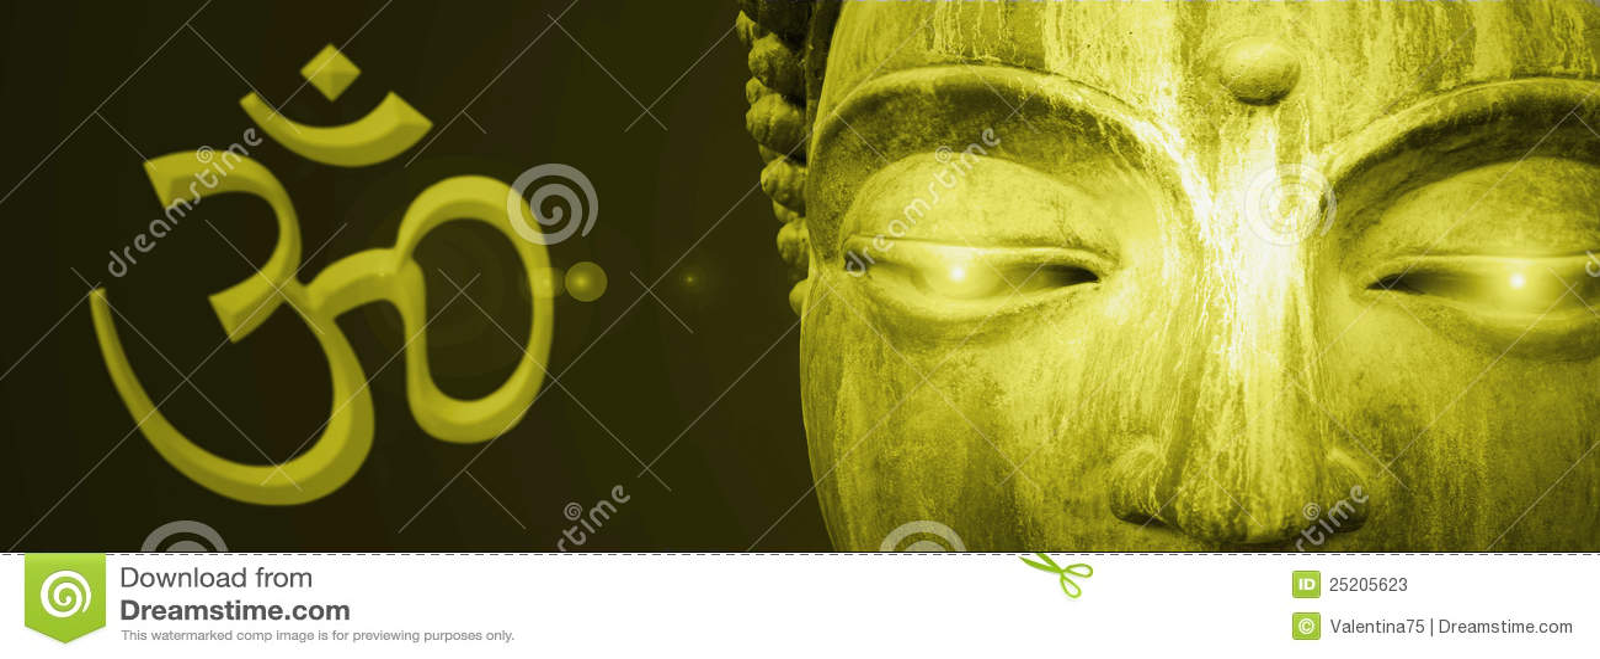 Abstrakt buddha